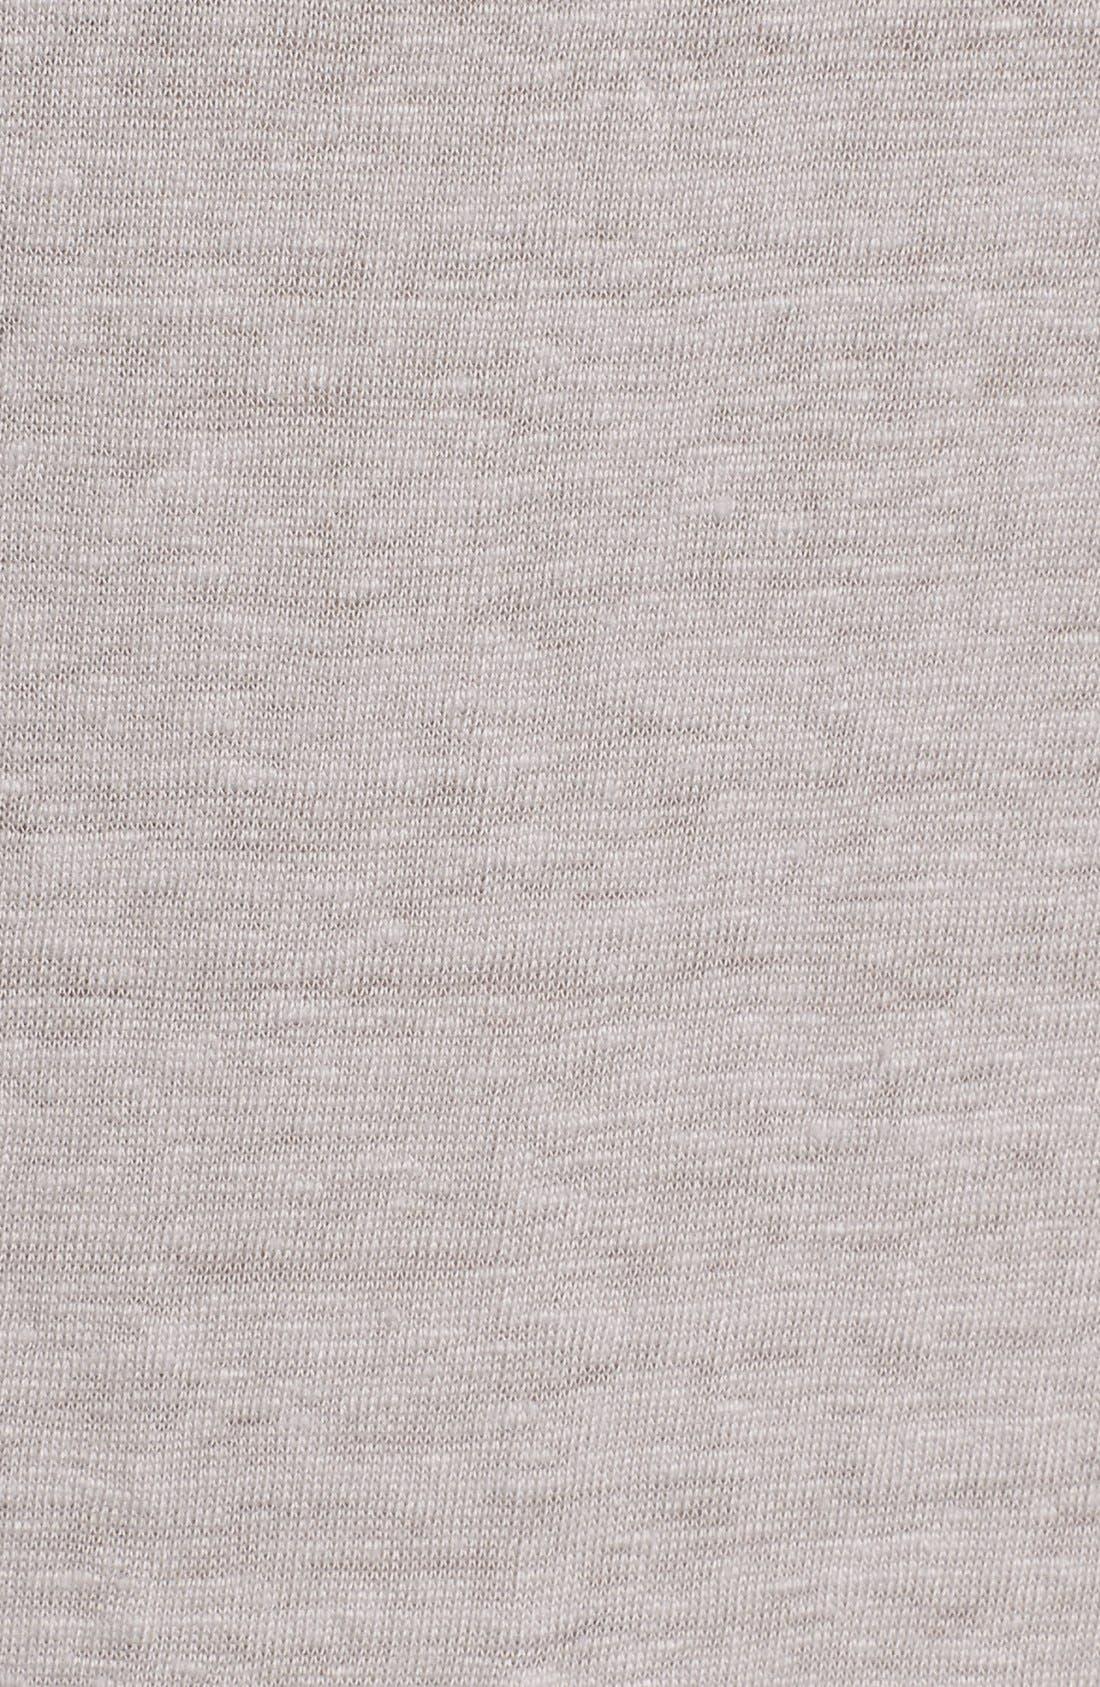 Bateau Neck Organic Linen Tunic,                             Alternate thumbnail 19, color,